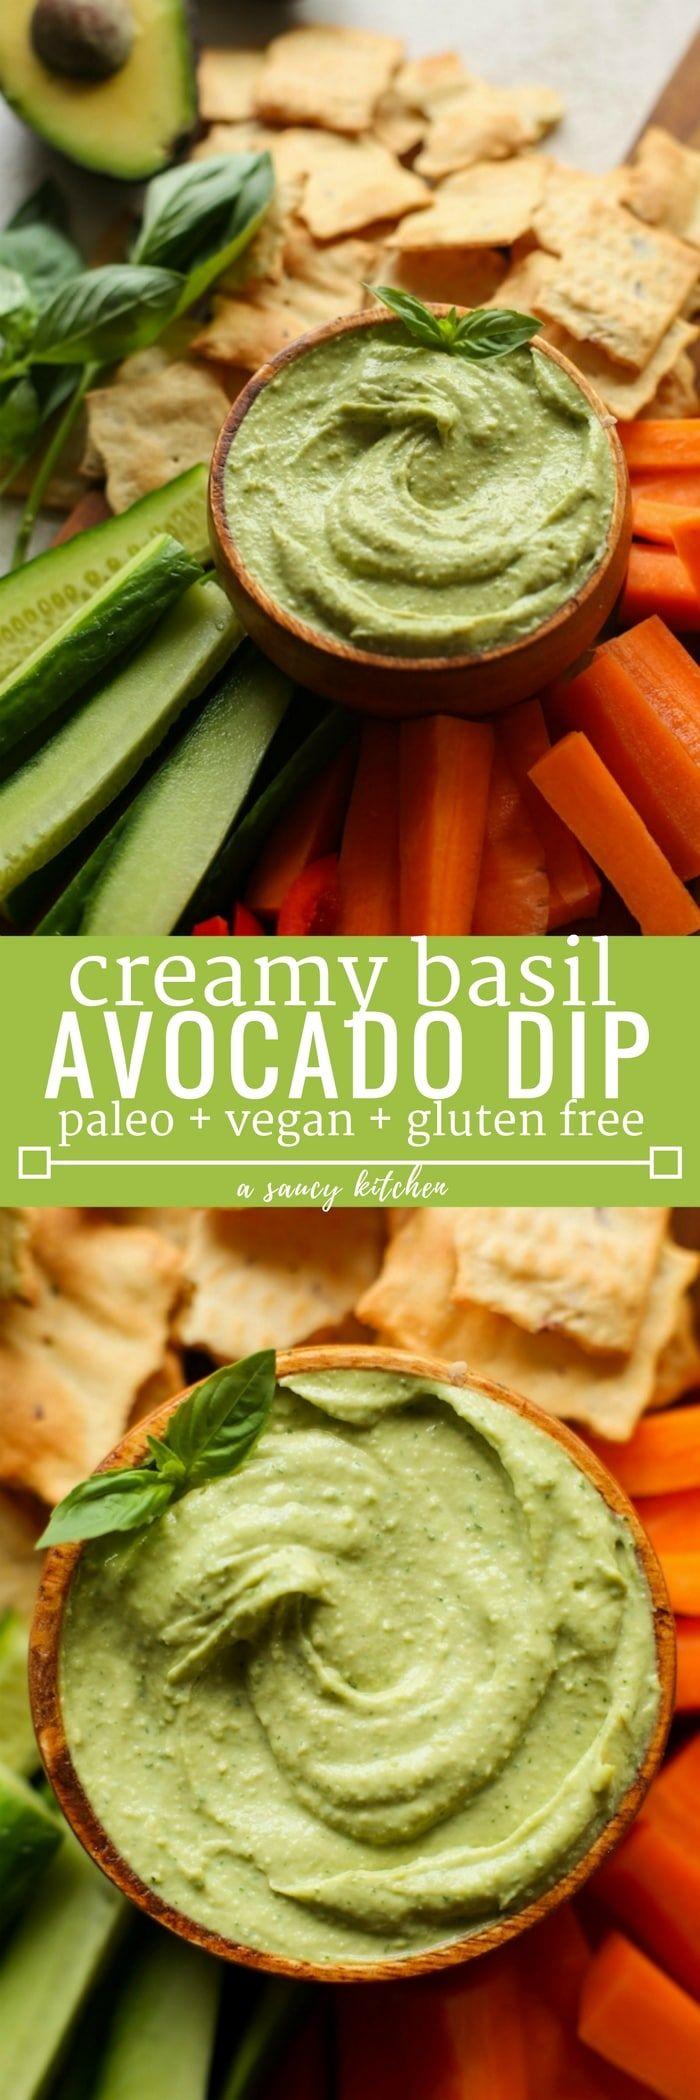 Creamy Basil Avocado Dip made with avocado, lemon juice, garlic, tahini, sea salt & fresh basil. | Gluten Free + Vegan + Paleo